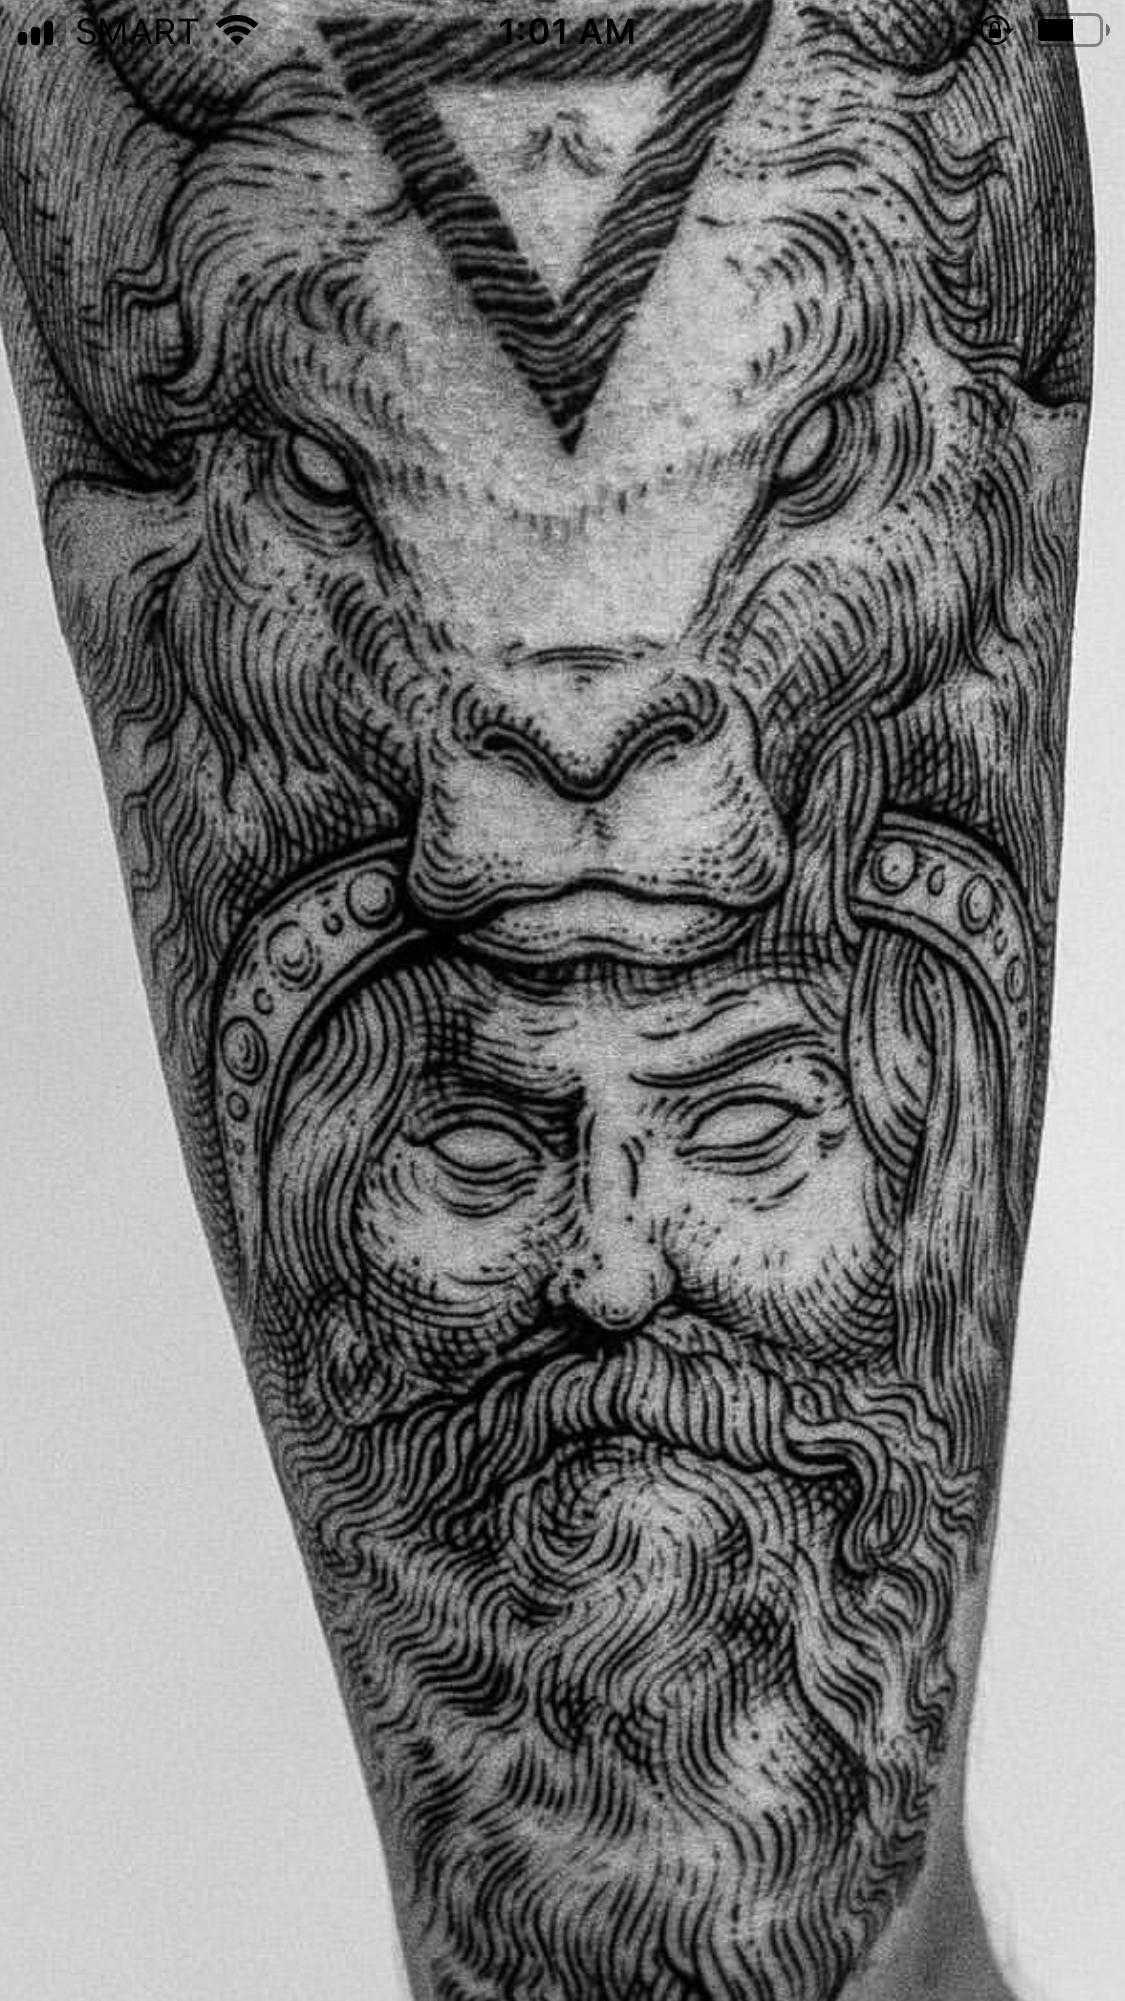 Awesome Linework Zeus Tattoo Black And Grey Gray Tattoo Design Works Body Art Tattoos Black Tattoos Black And Grey Tattoos